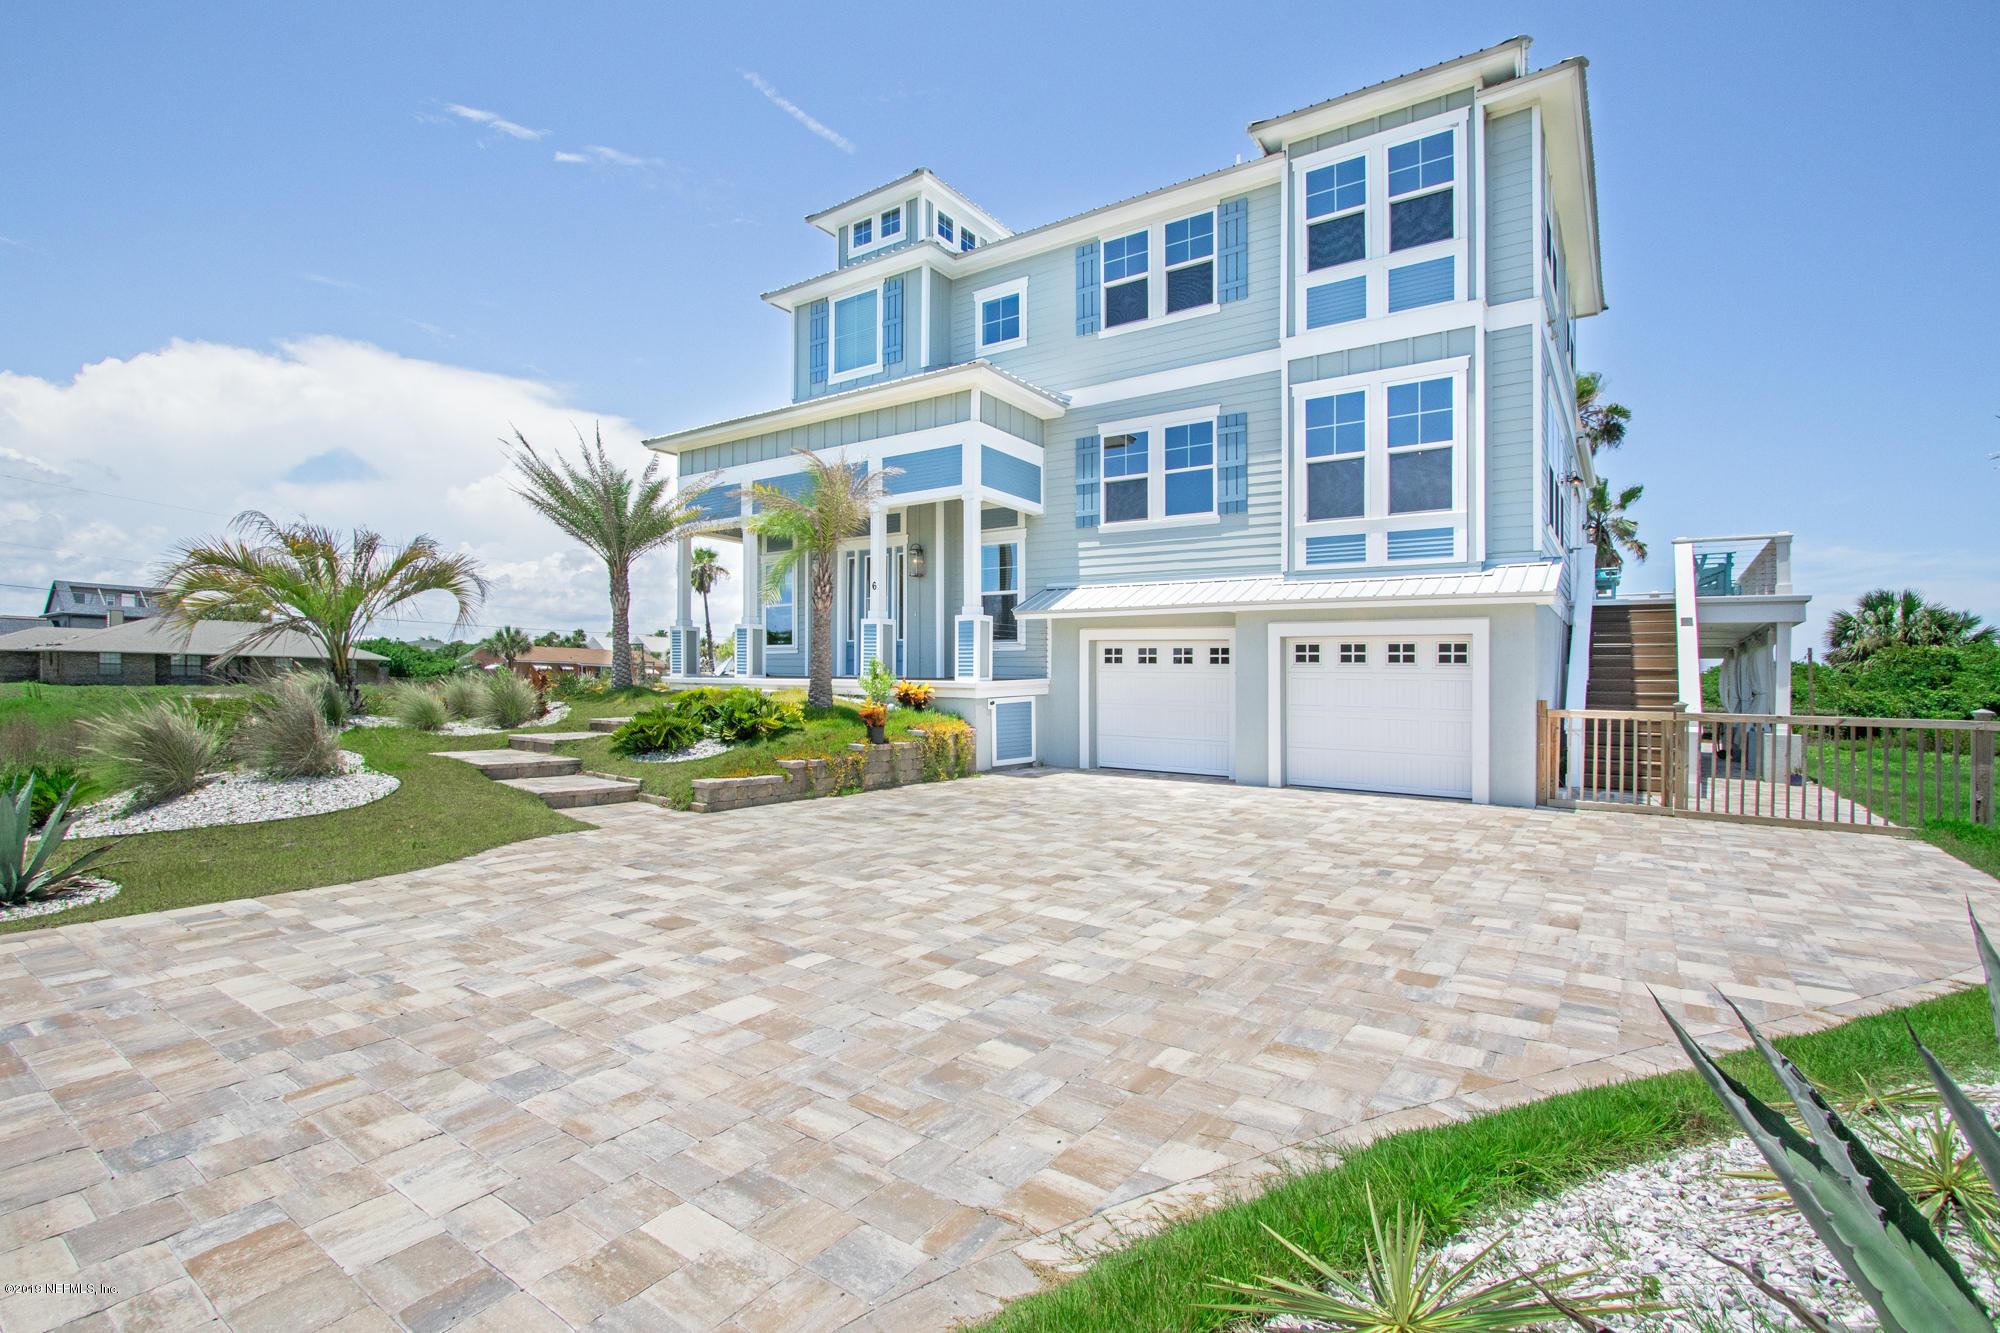 6 OCEANSIDE, ST AUGUSTINE, FLORIDA 32080, 5 Bedrooms Bedrooms, ,4 BathroomsBathrooms,Residential - single family,For sale,OCEANSIDE,1005230